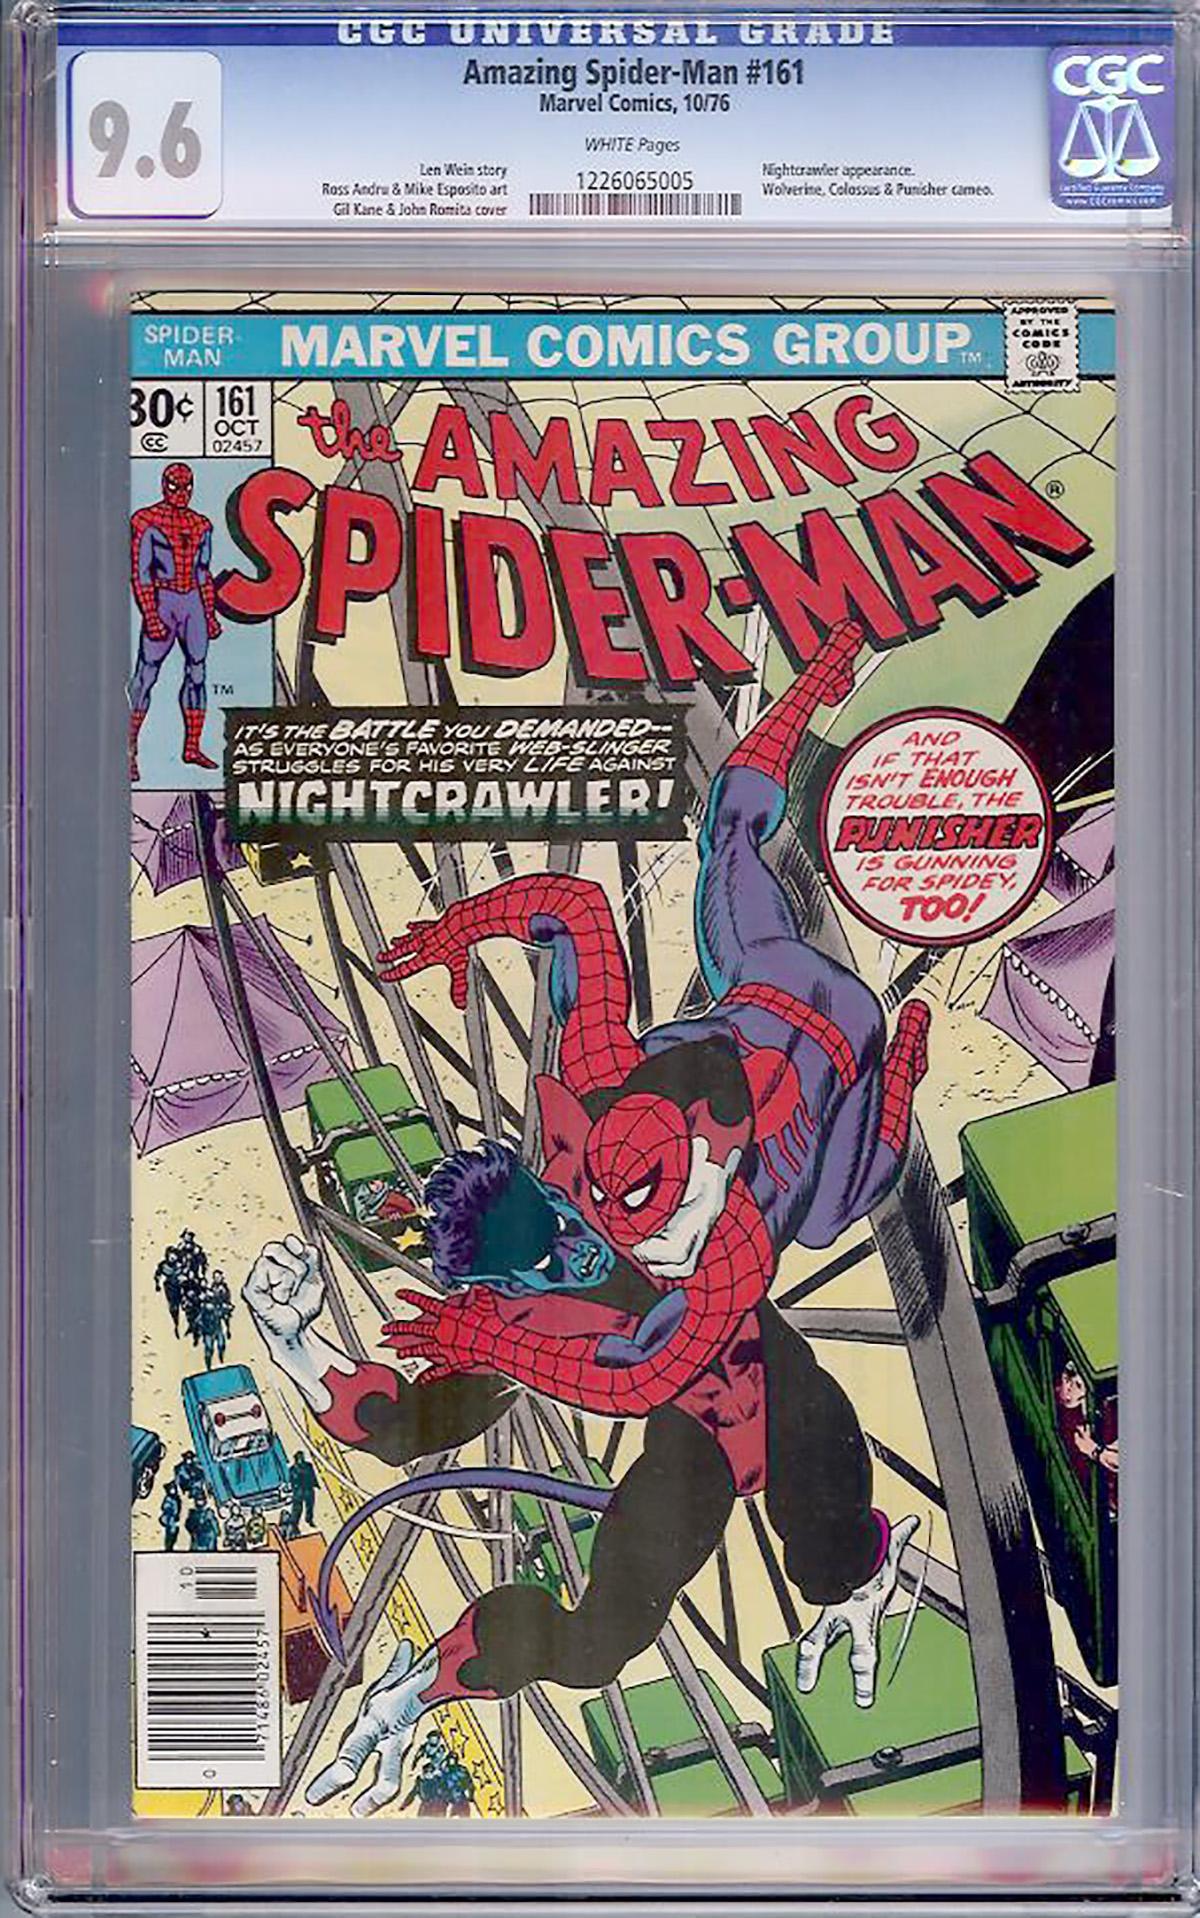 Amazing Spider-Man #161 CGC 9.6 w